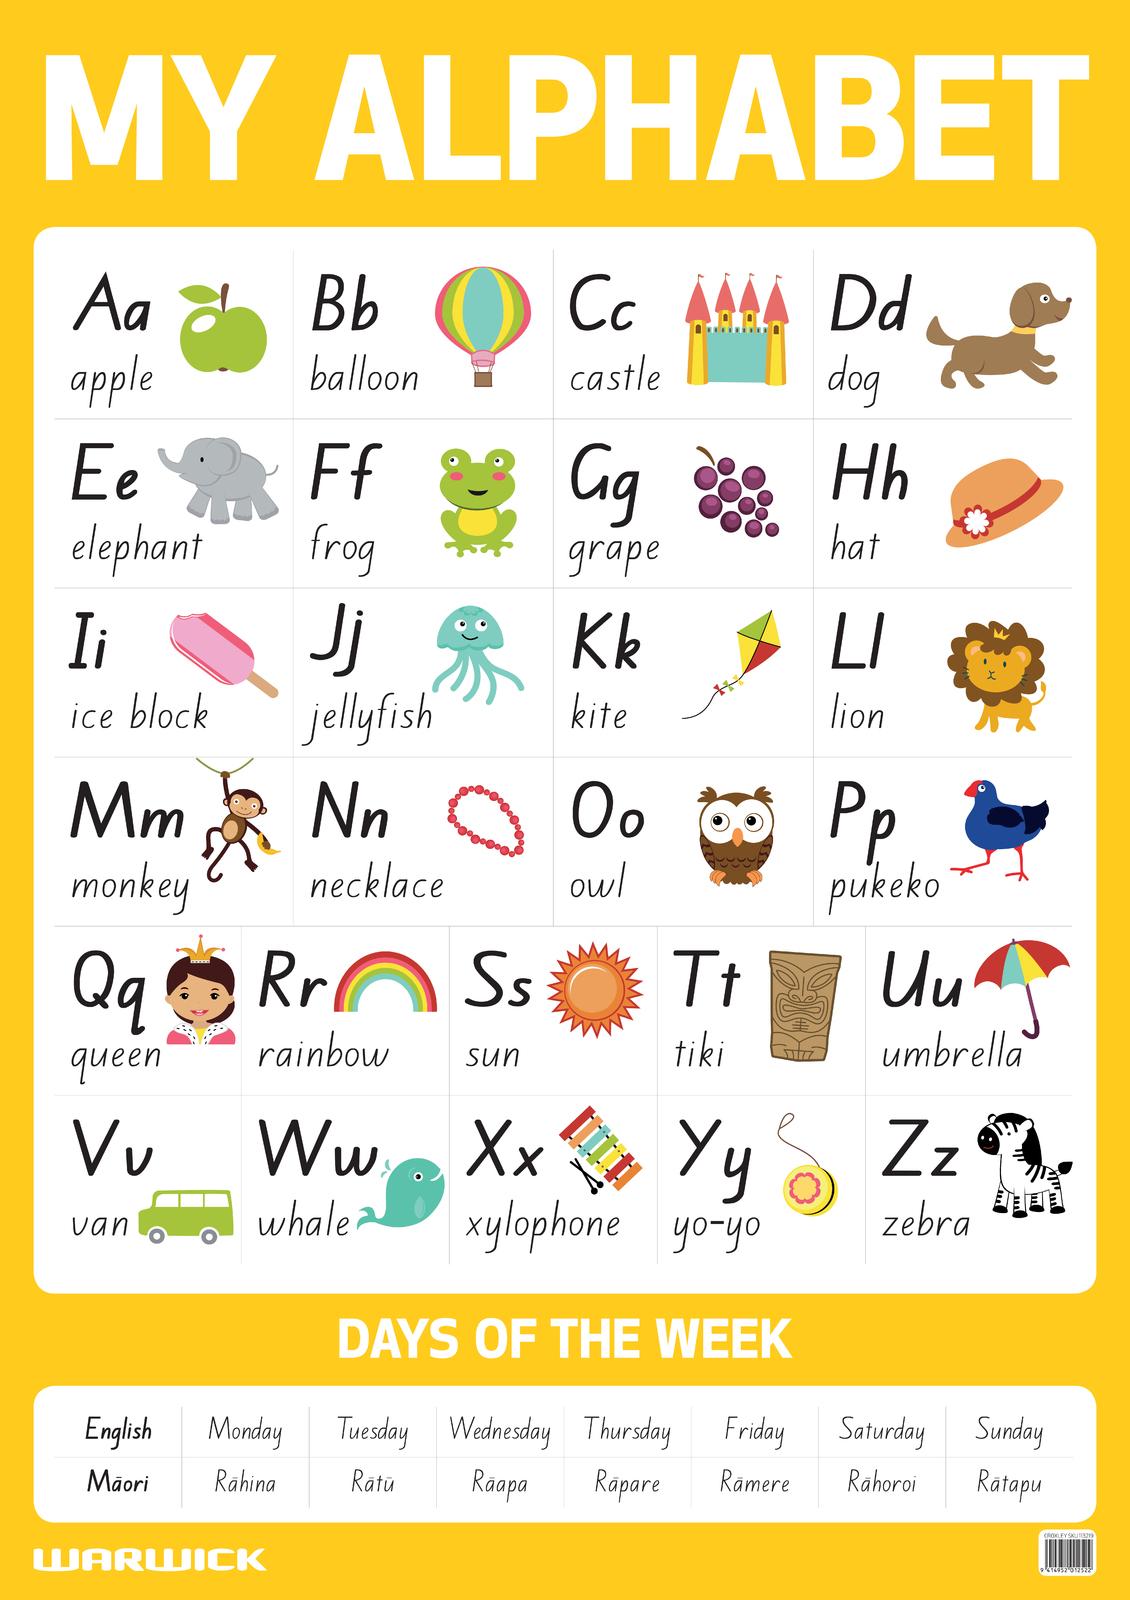 Warwick: My Literacy Poster 1 - Alphabet image